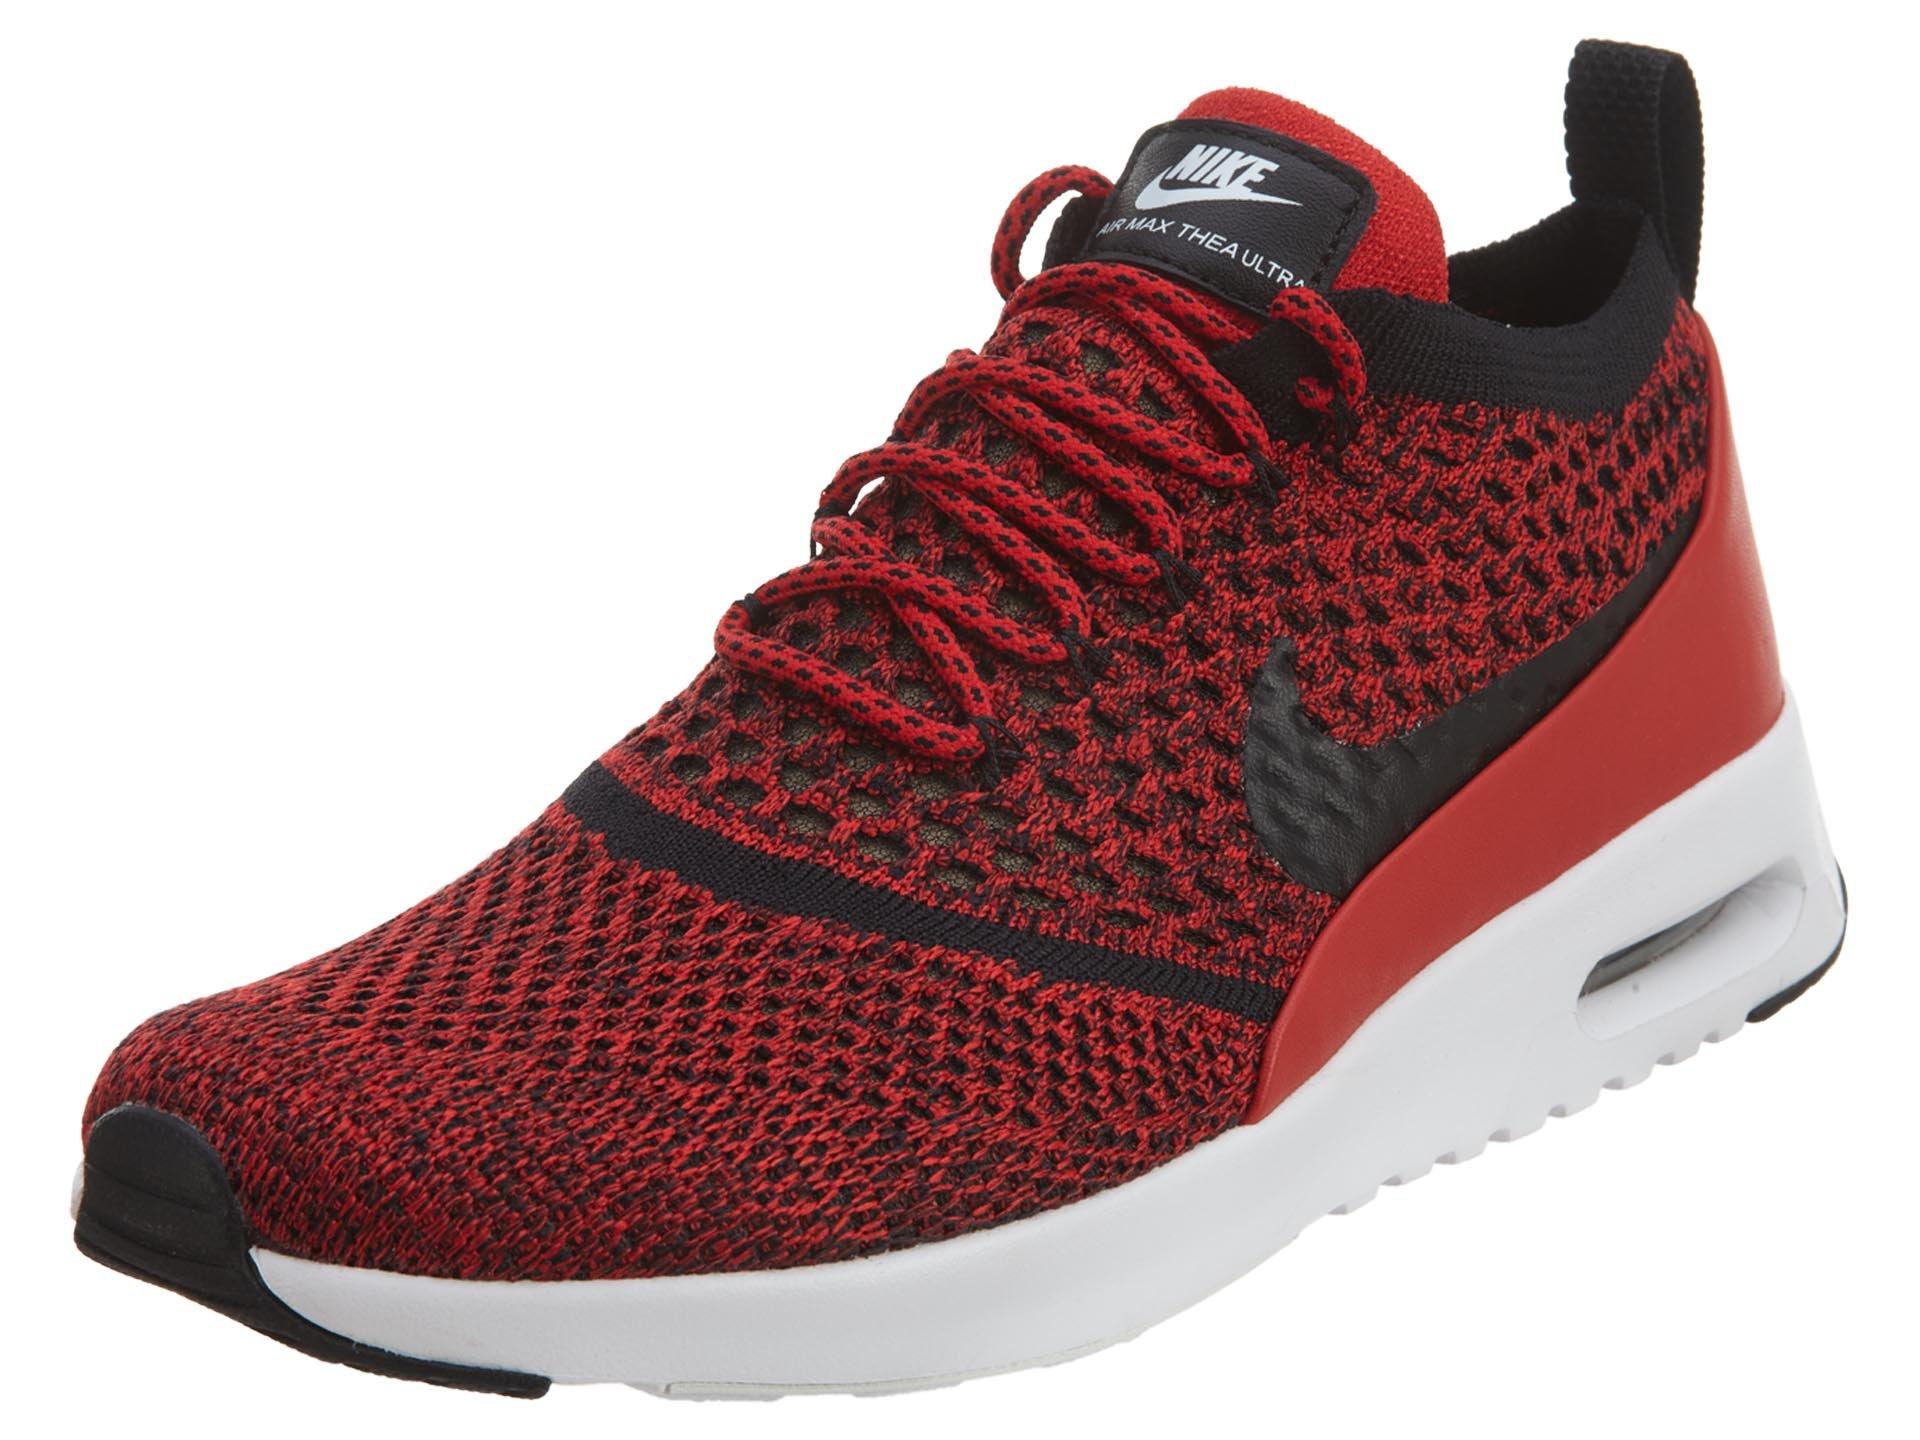 New Women Nike Air Max Thea Ultra Flyknit FK Crimson Raisen